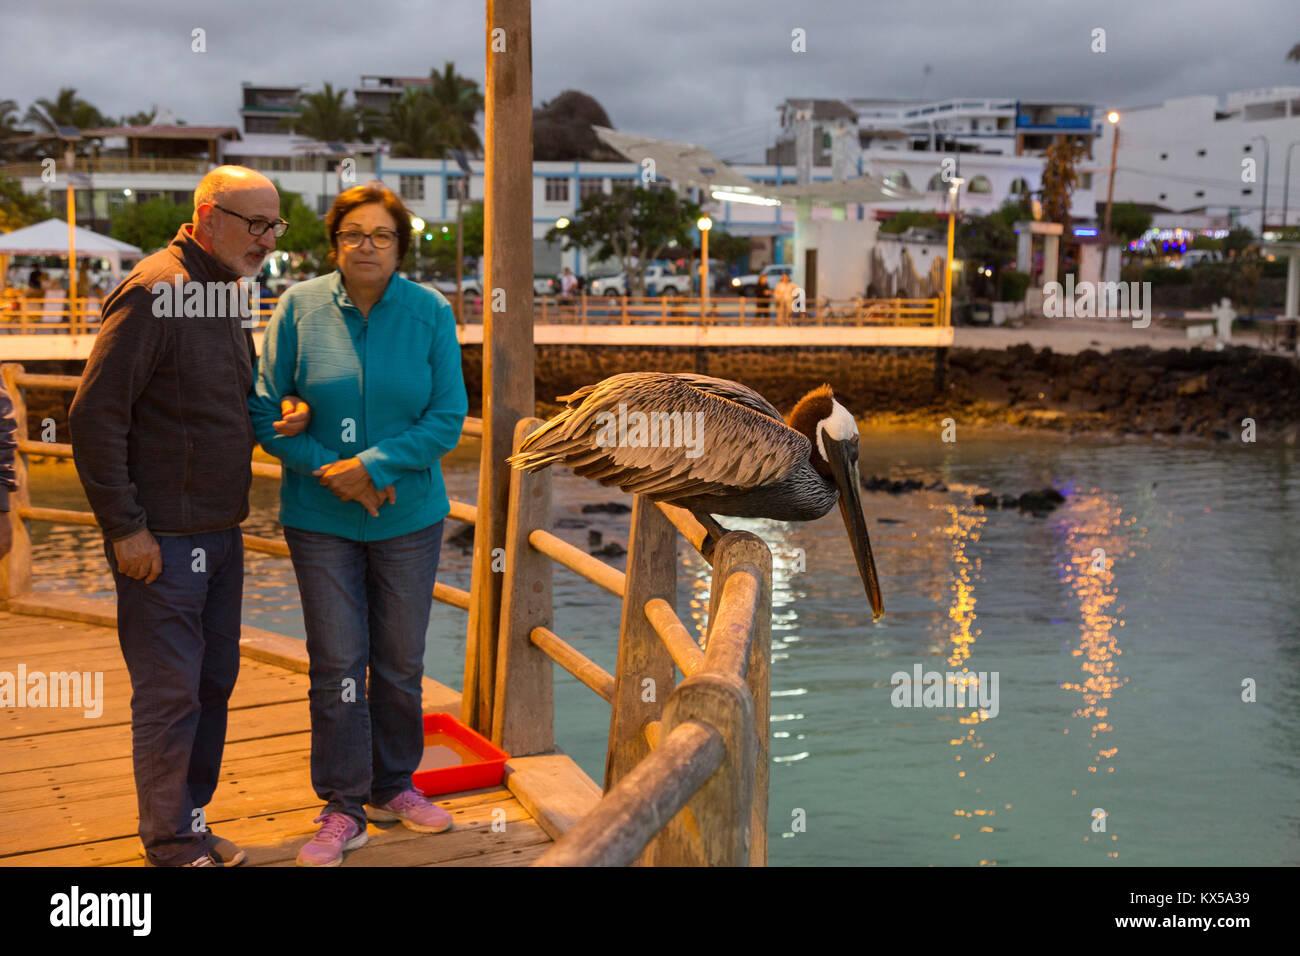 Galapagos Islands - a tourist couple looking at a brown pelican, Puerto Ayora, San Cristobal Island, Galapagos Islands - Stock Image